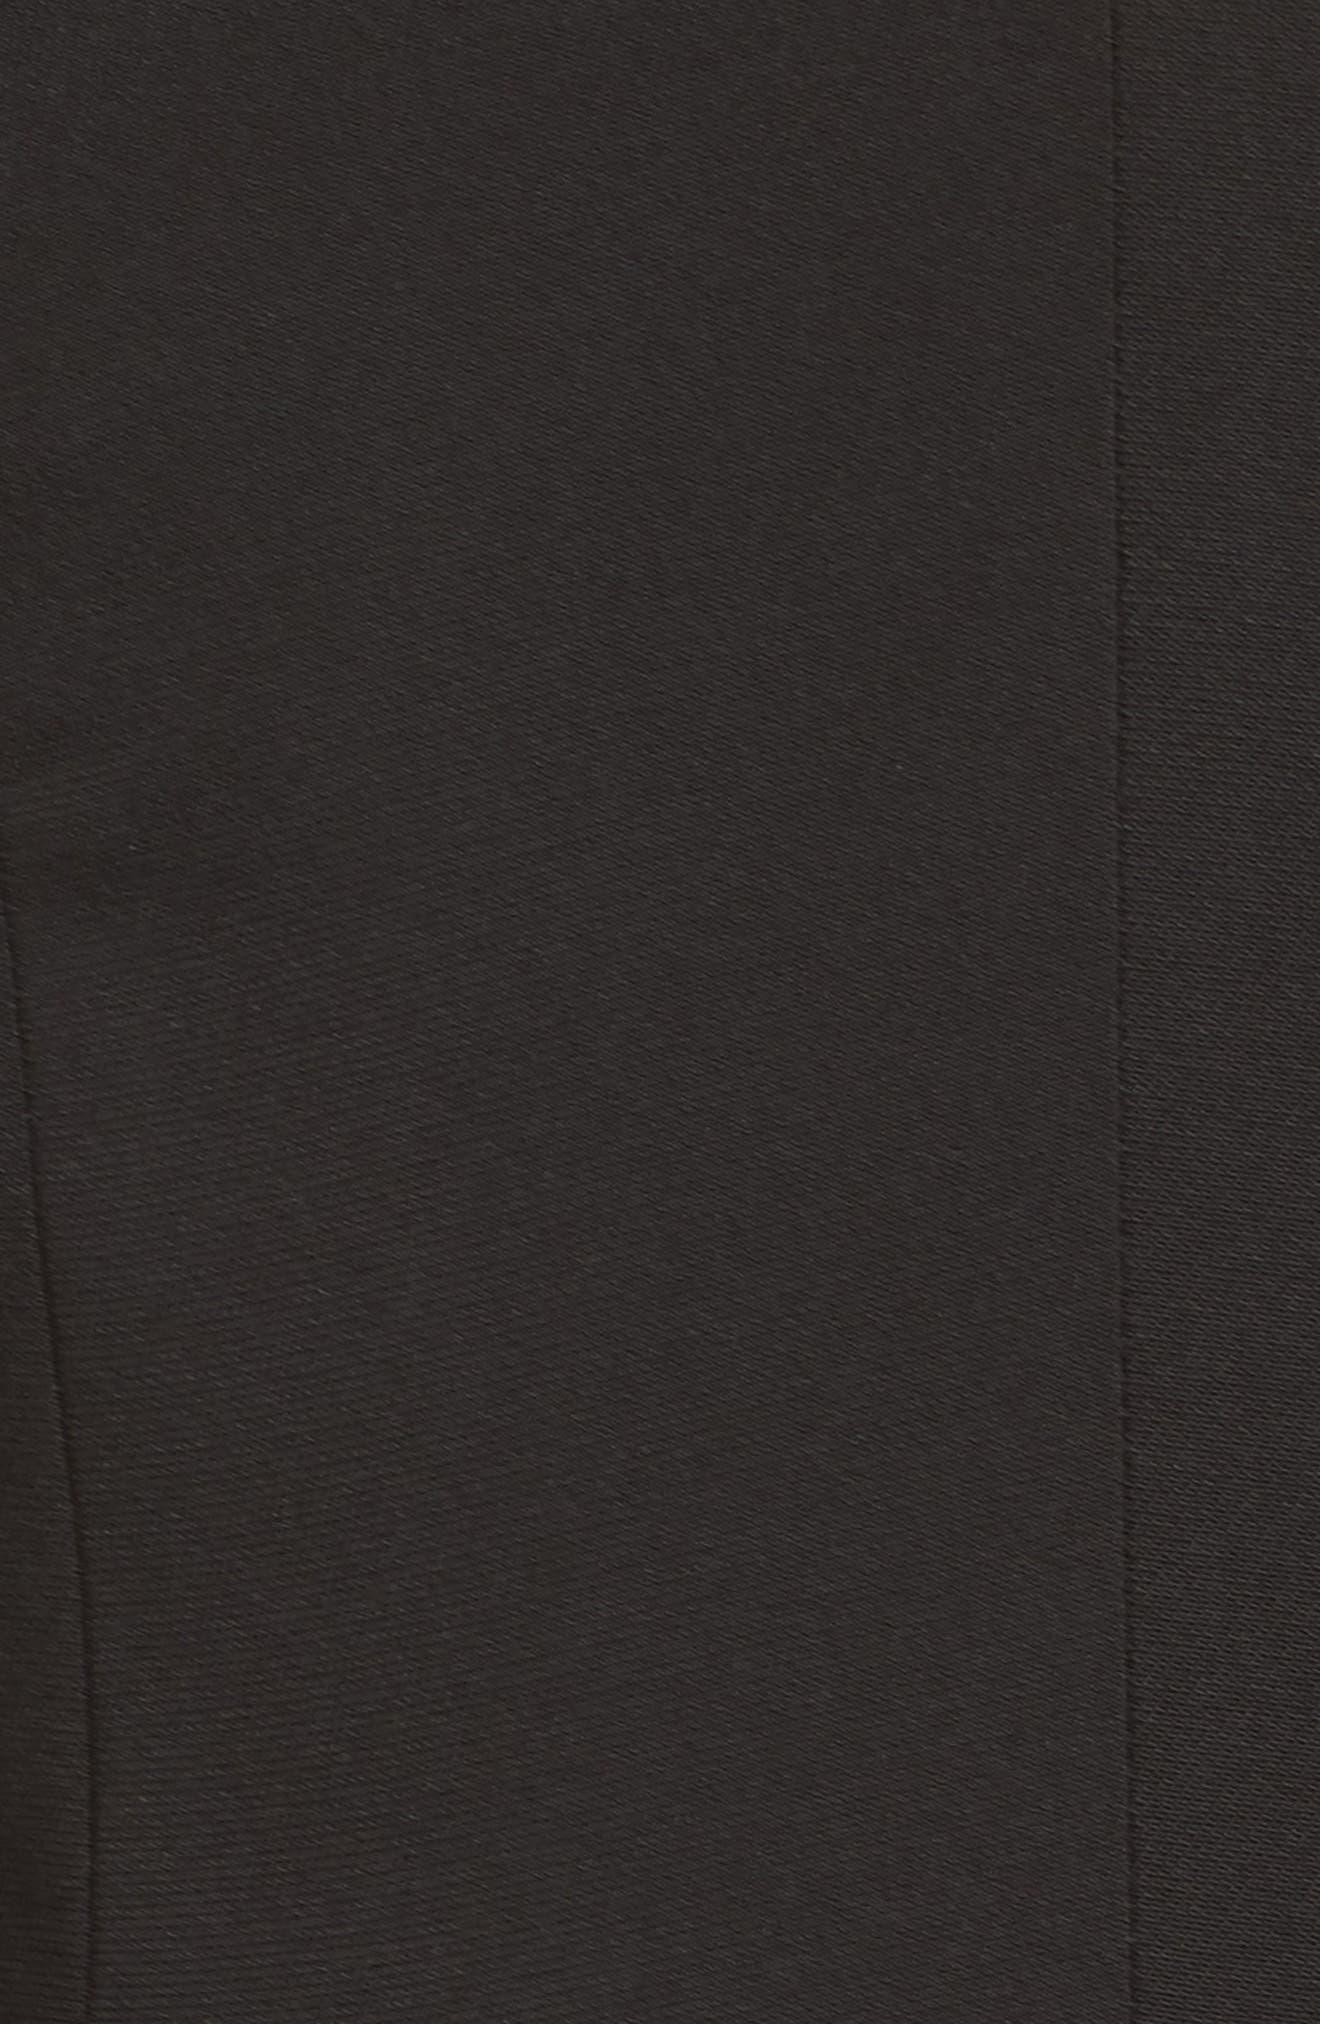 Tamika Sleeveless Fit & Flare Dress,                             Alternate thumbnail 6, color,                             001